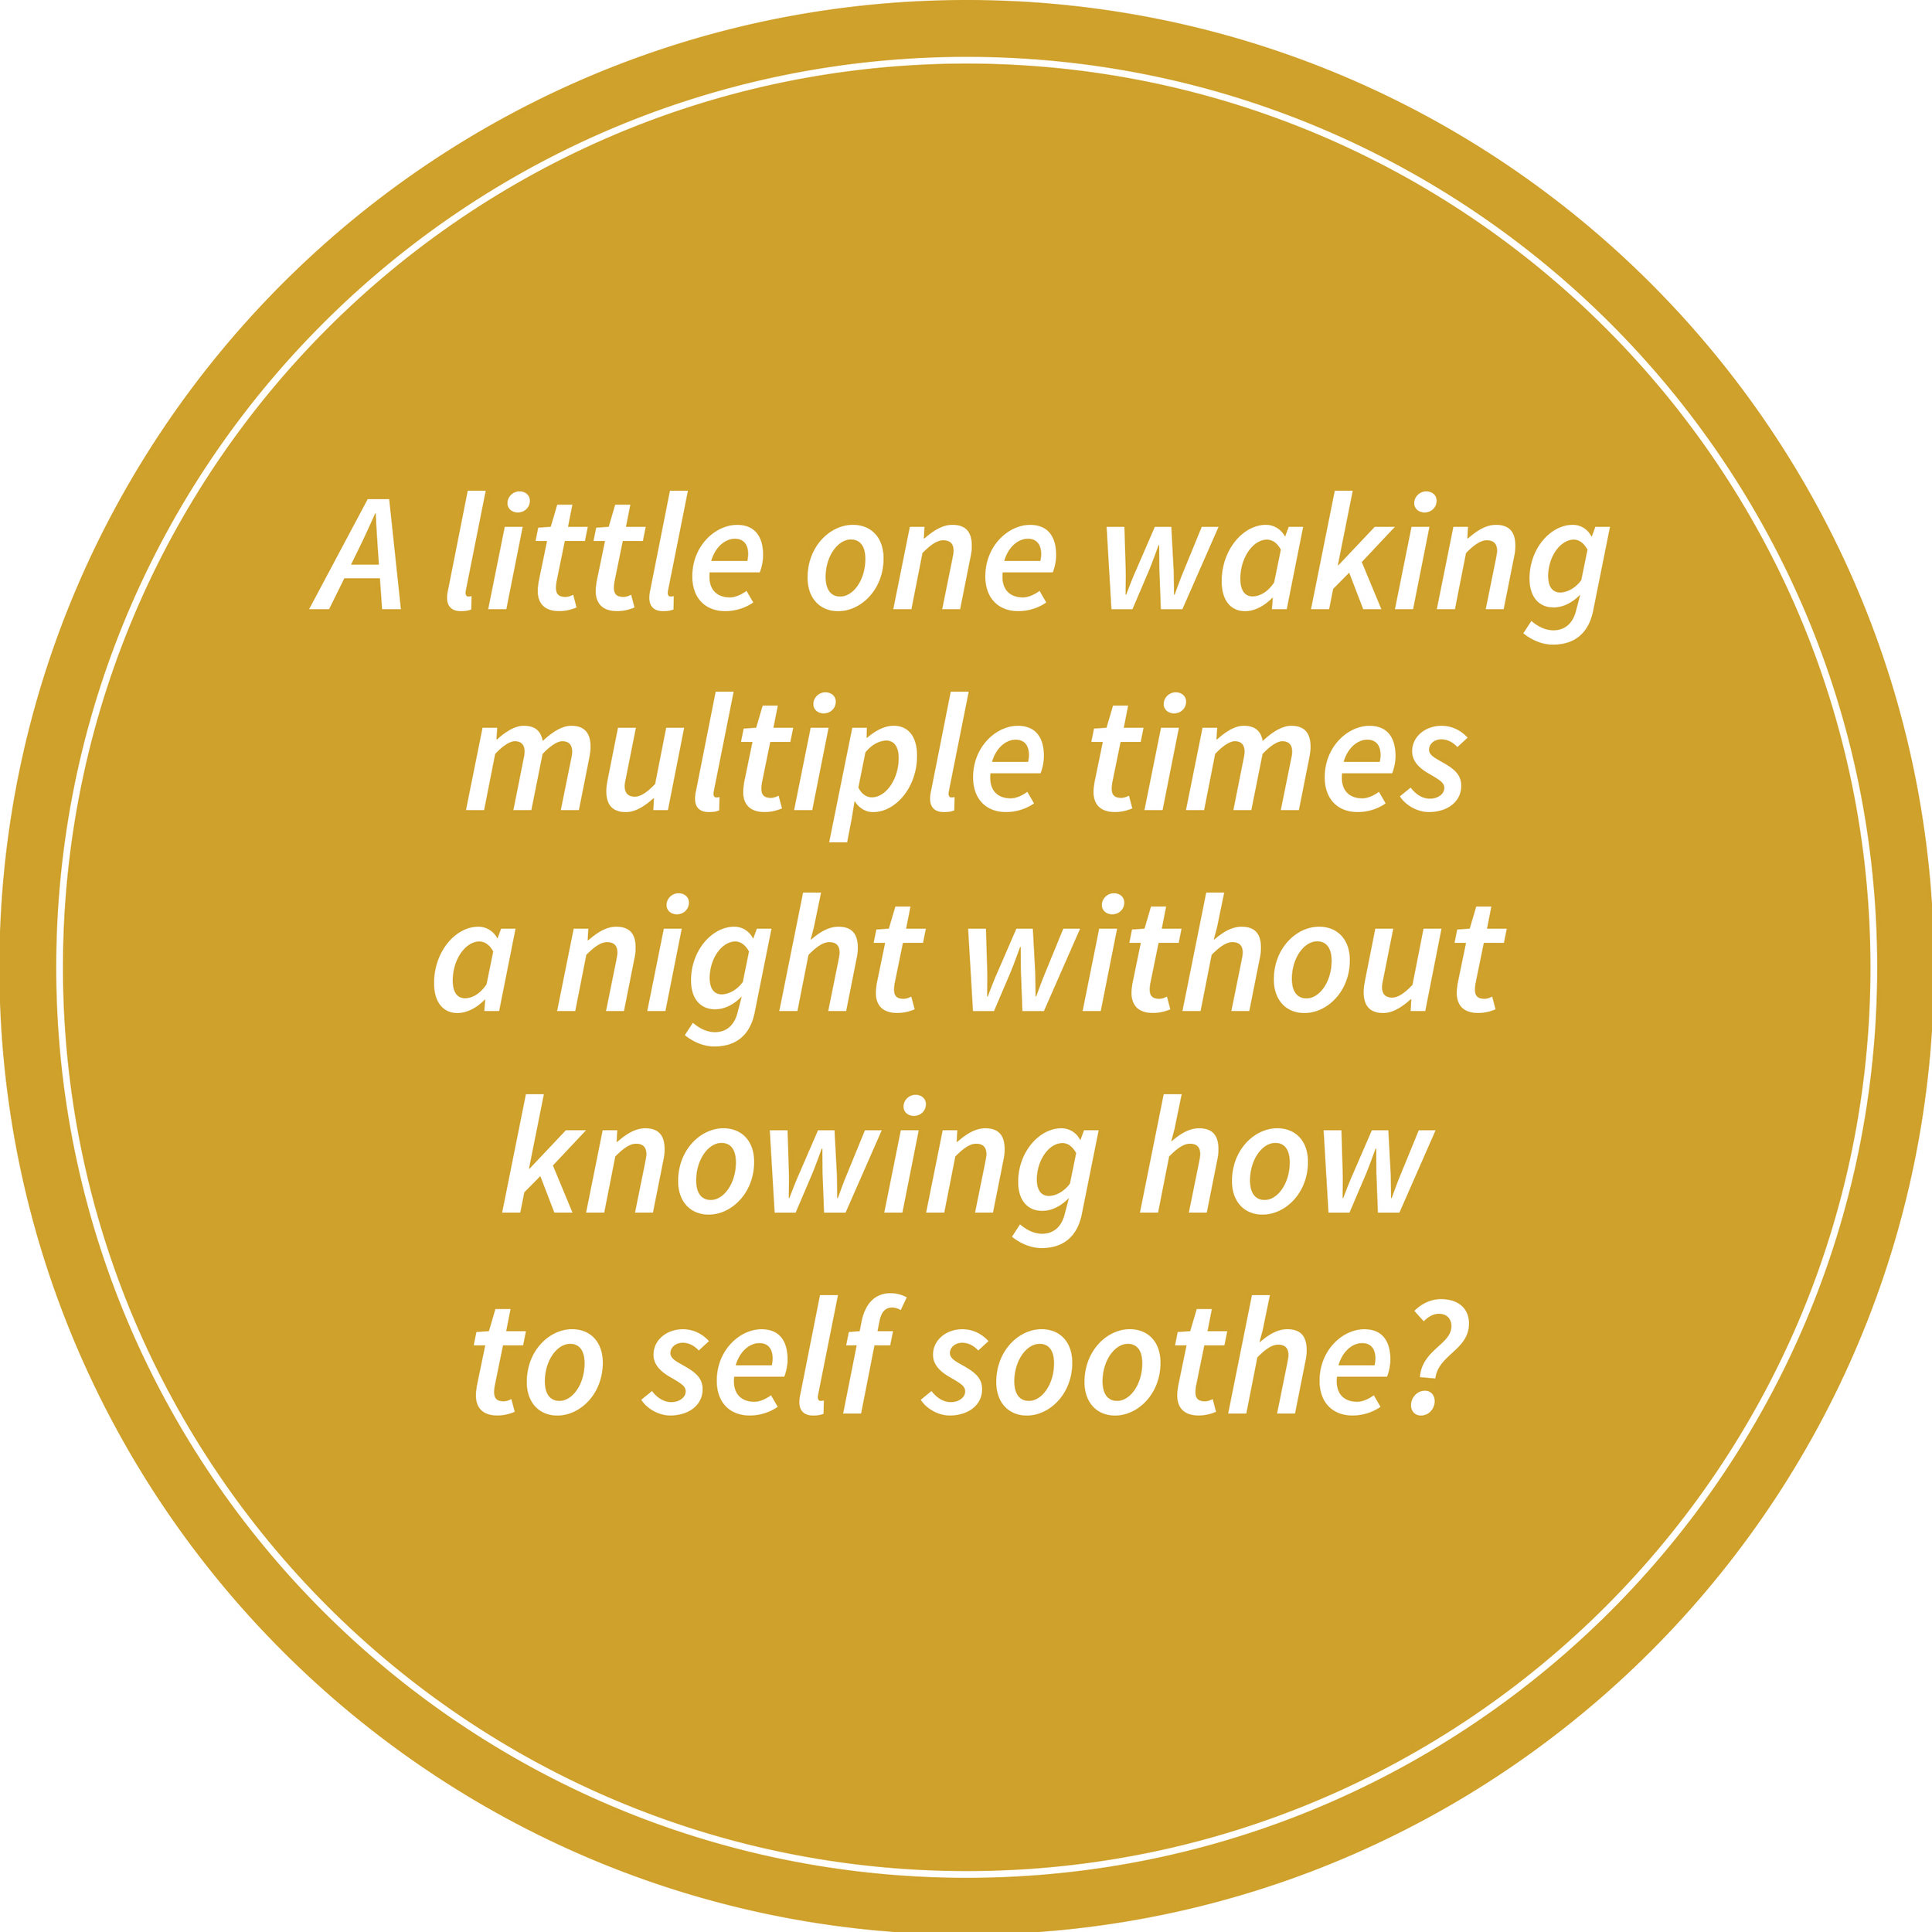 self-soothe